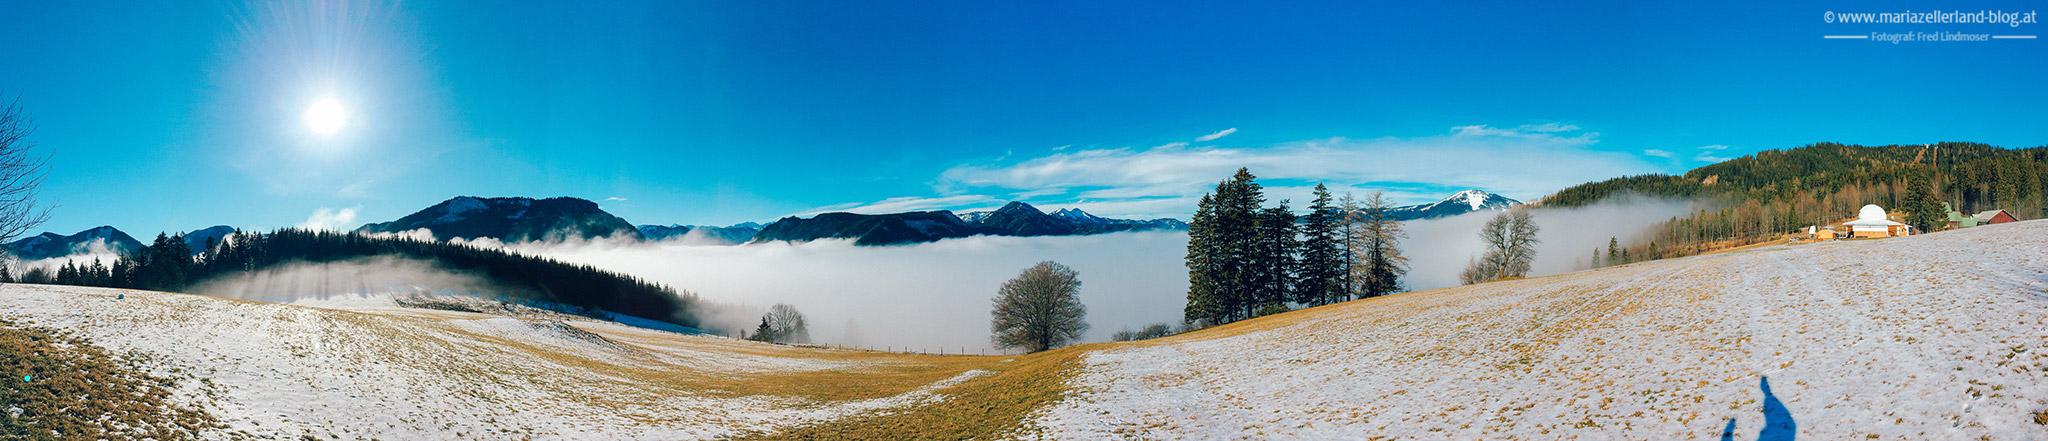 Mariazell-Winter-Nebel-Basilika-2271